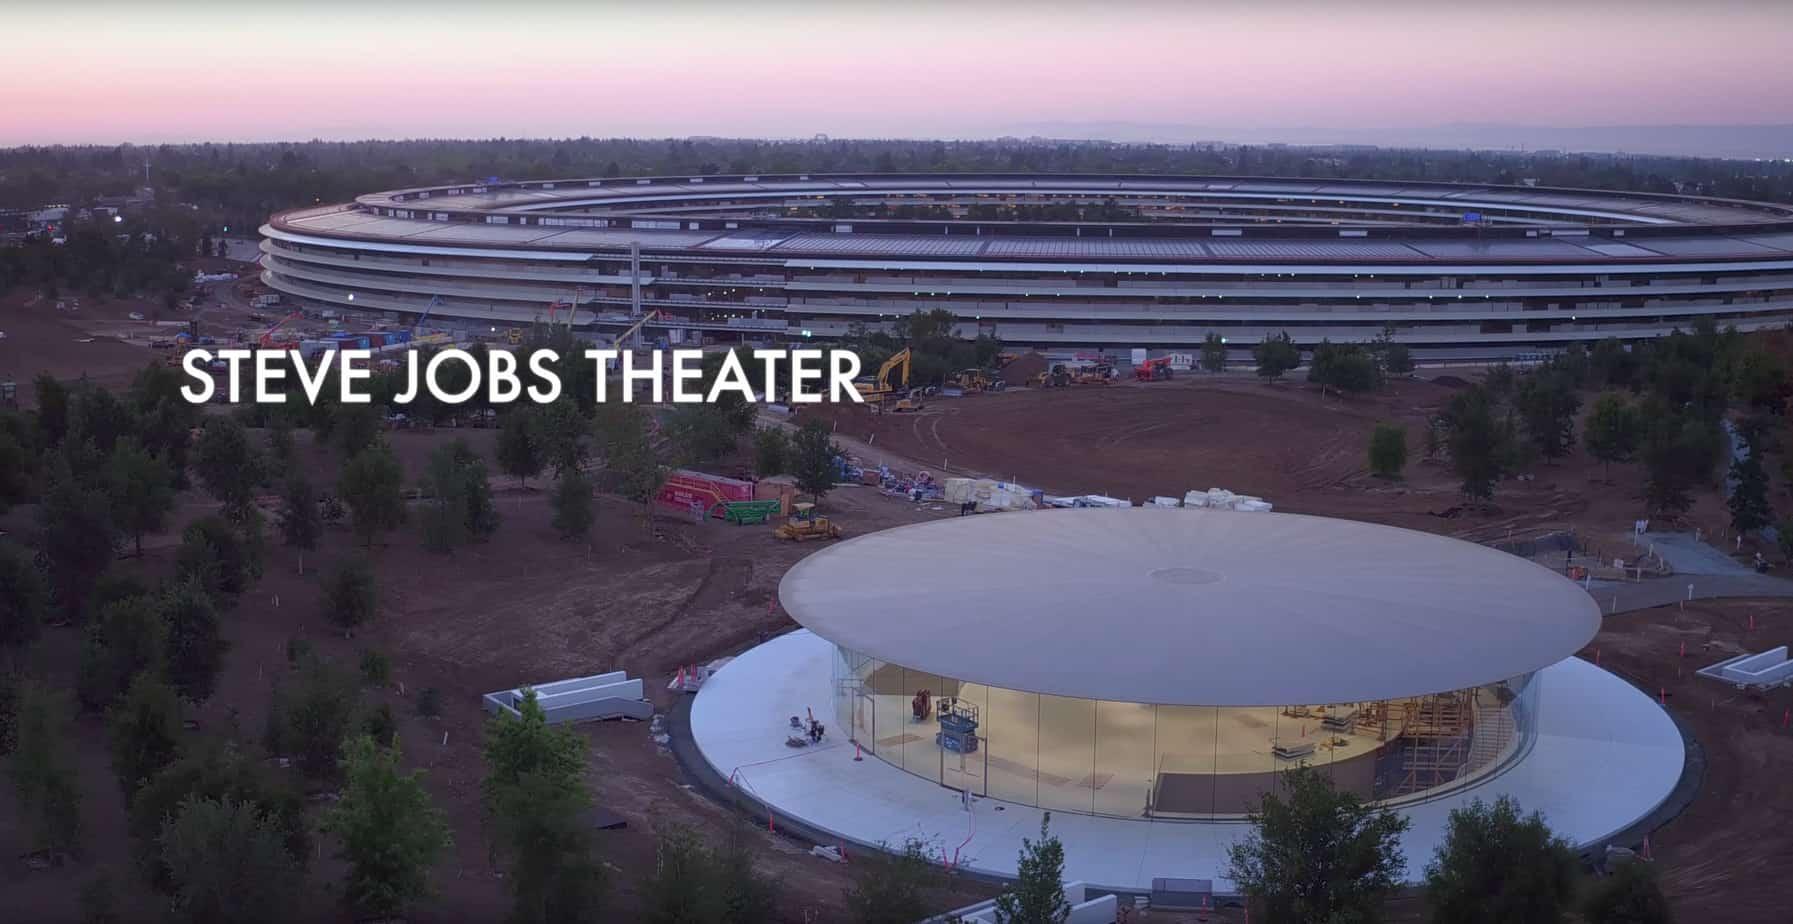 steve jobs theater